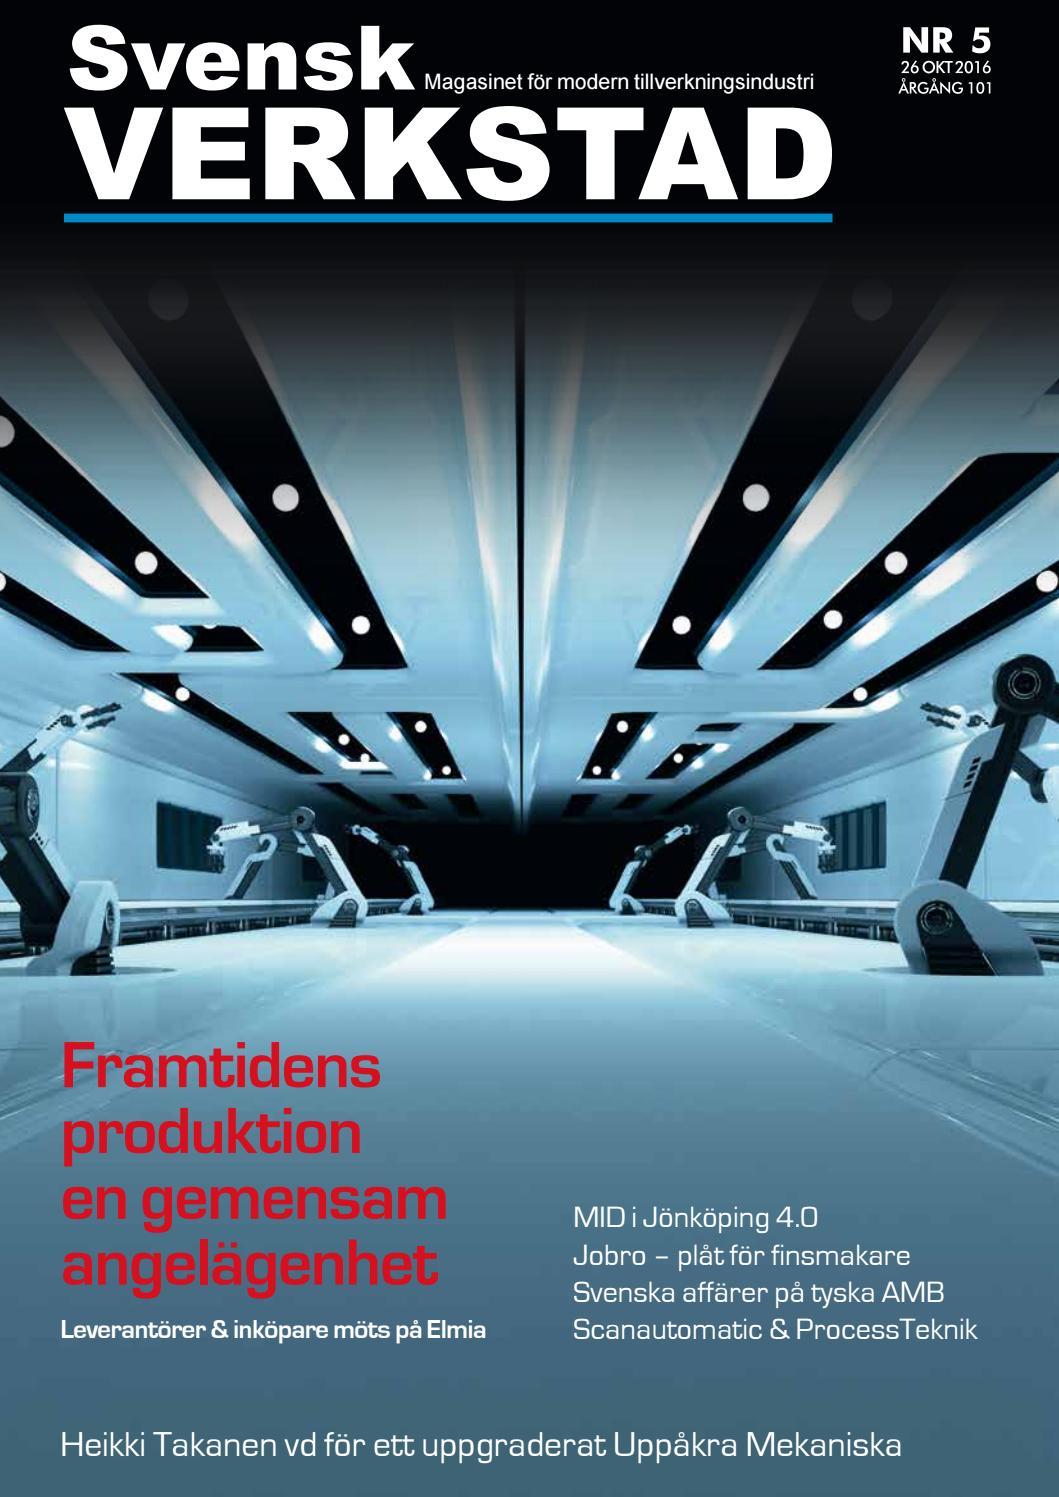 Munktellkulan 2014 2014, Eskilstuna - IdrottOnline